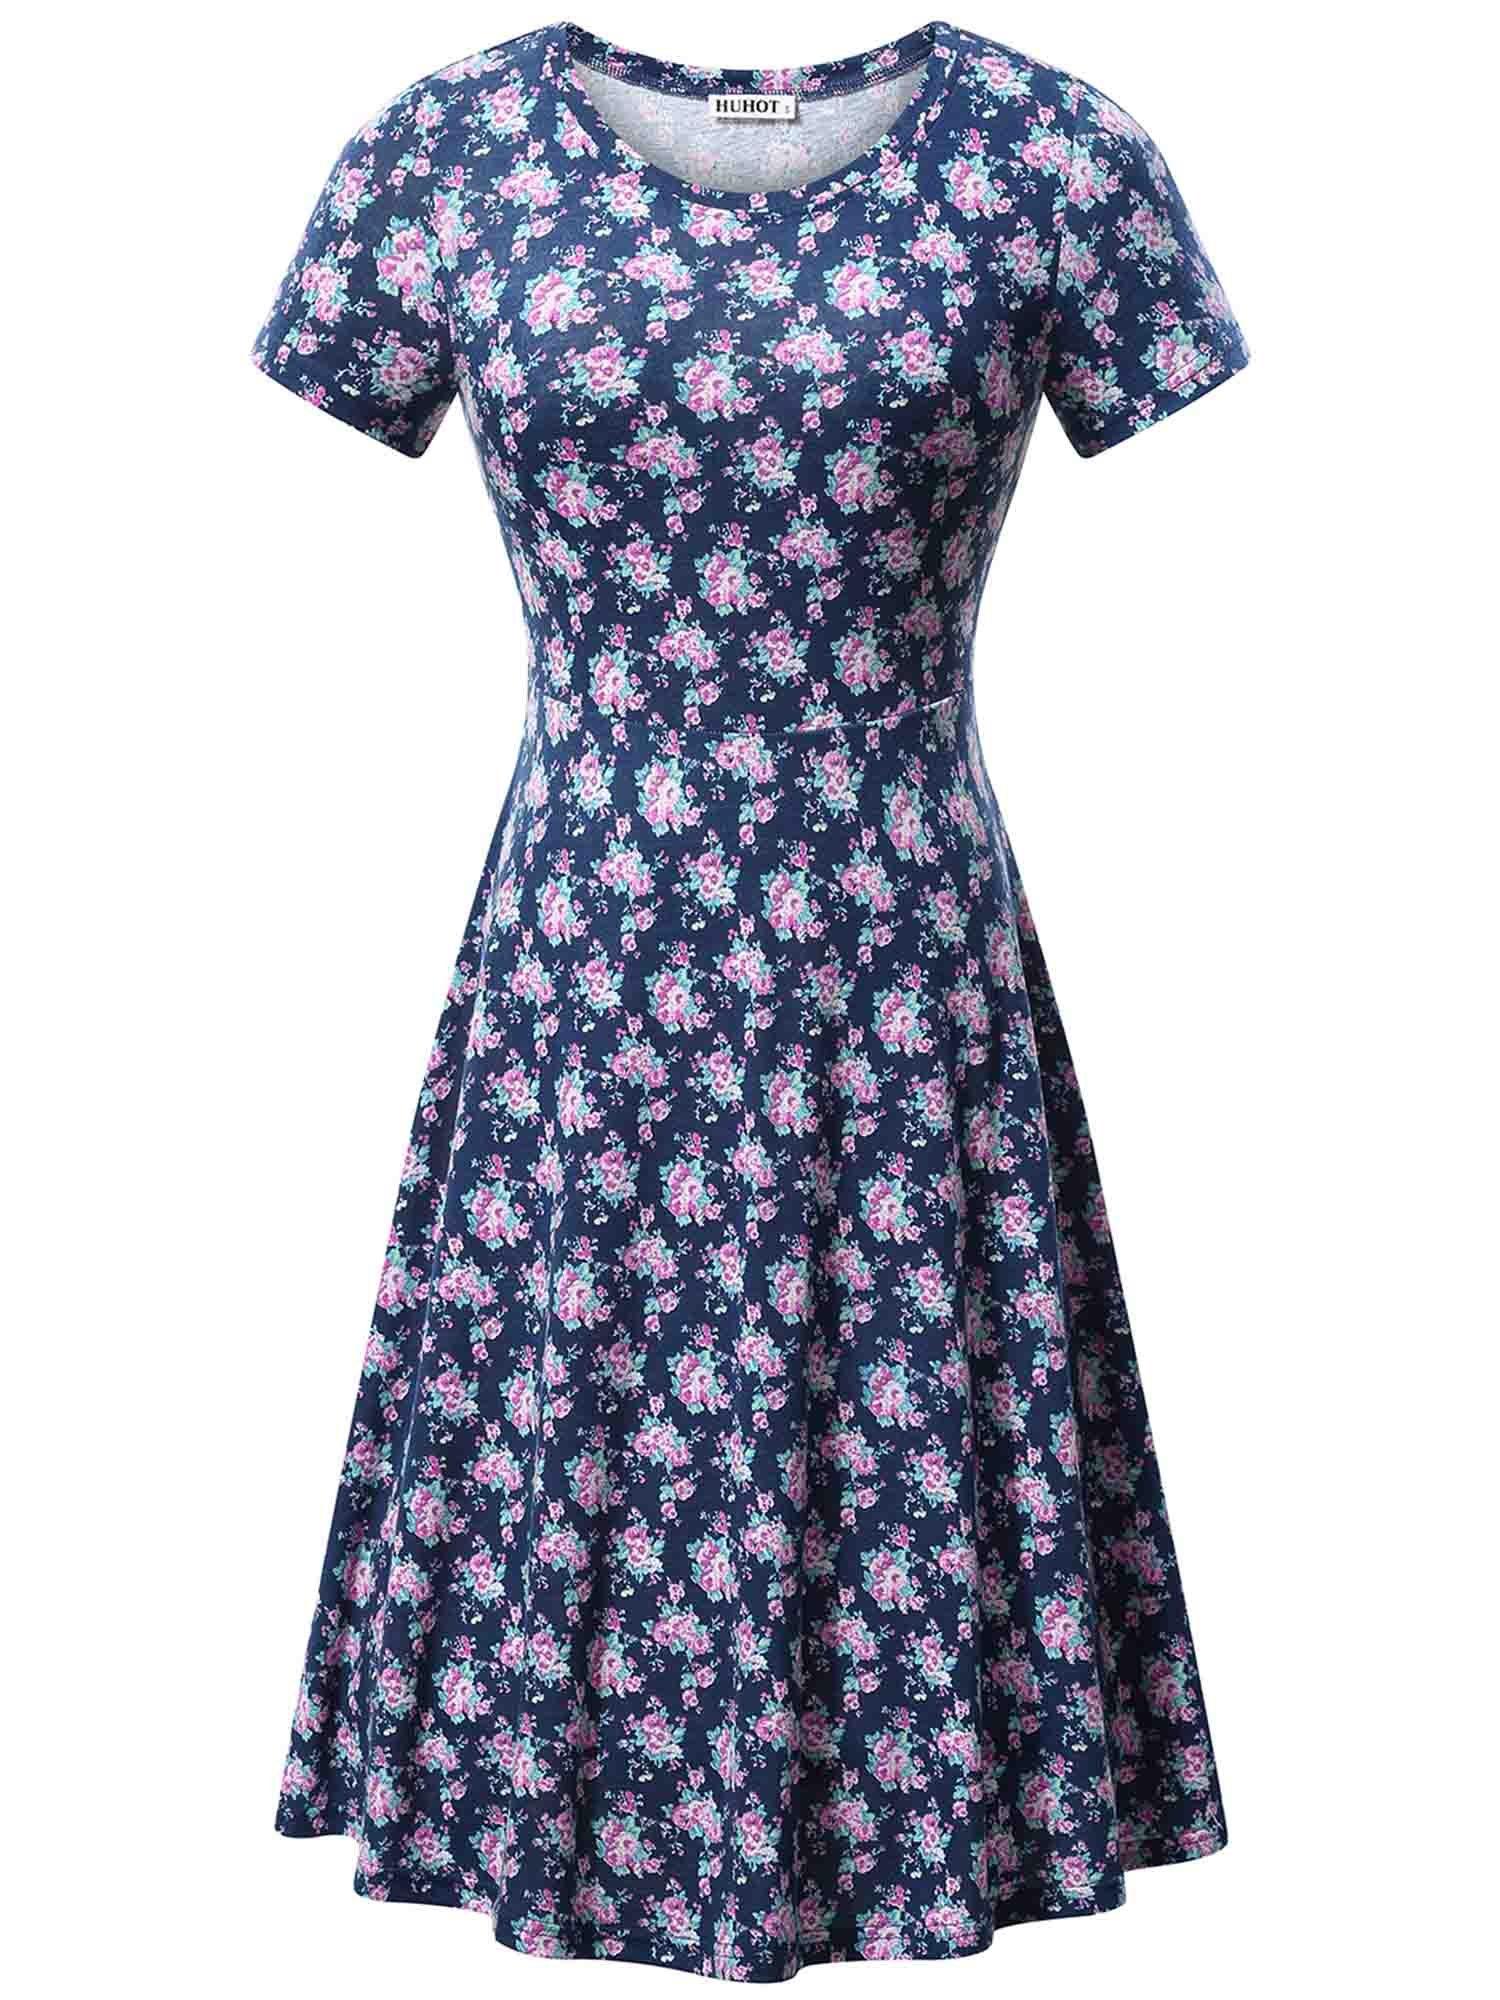 HUHOT Elegant Dresses, Short Sleeve Fit and Flared Modest Midi Dress(Flower46,X-Large)